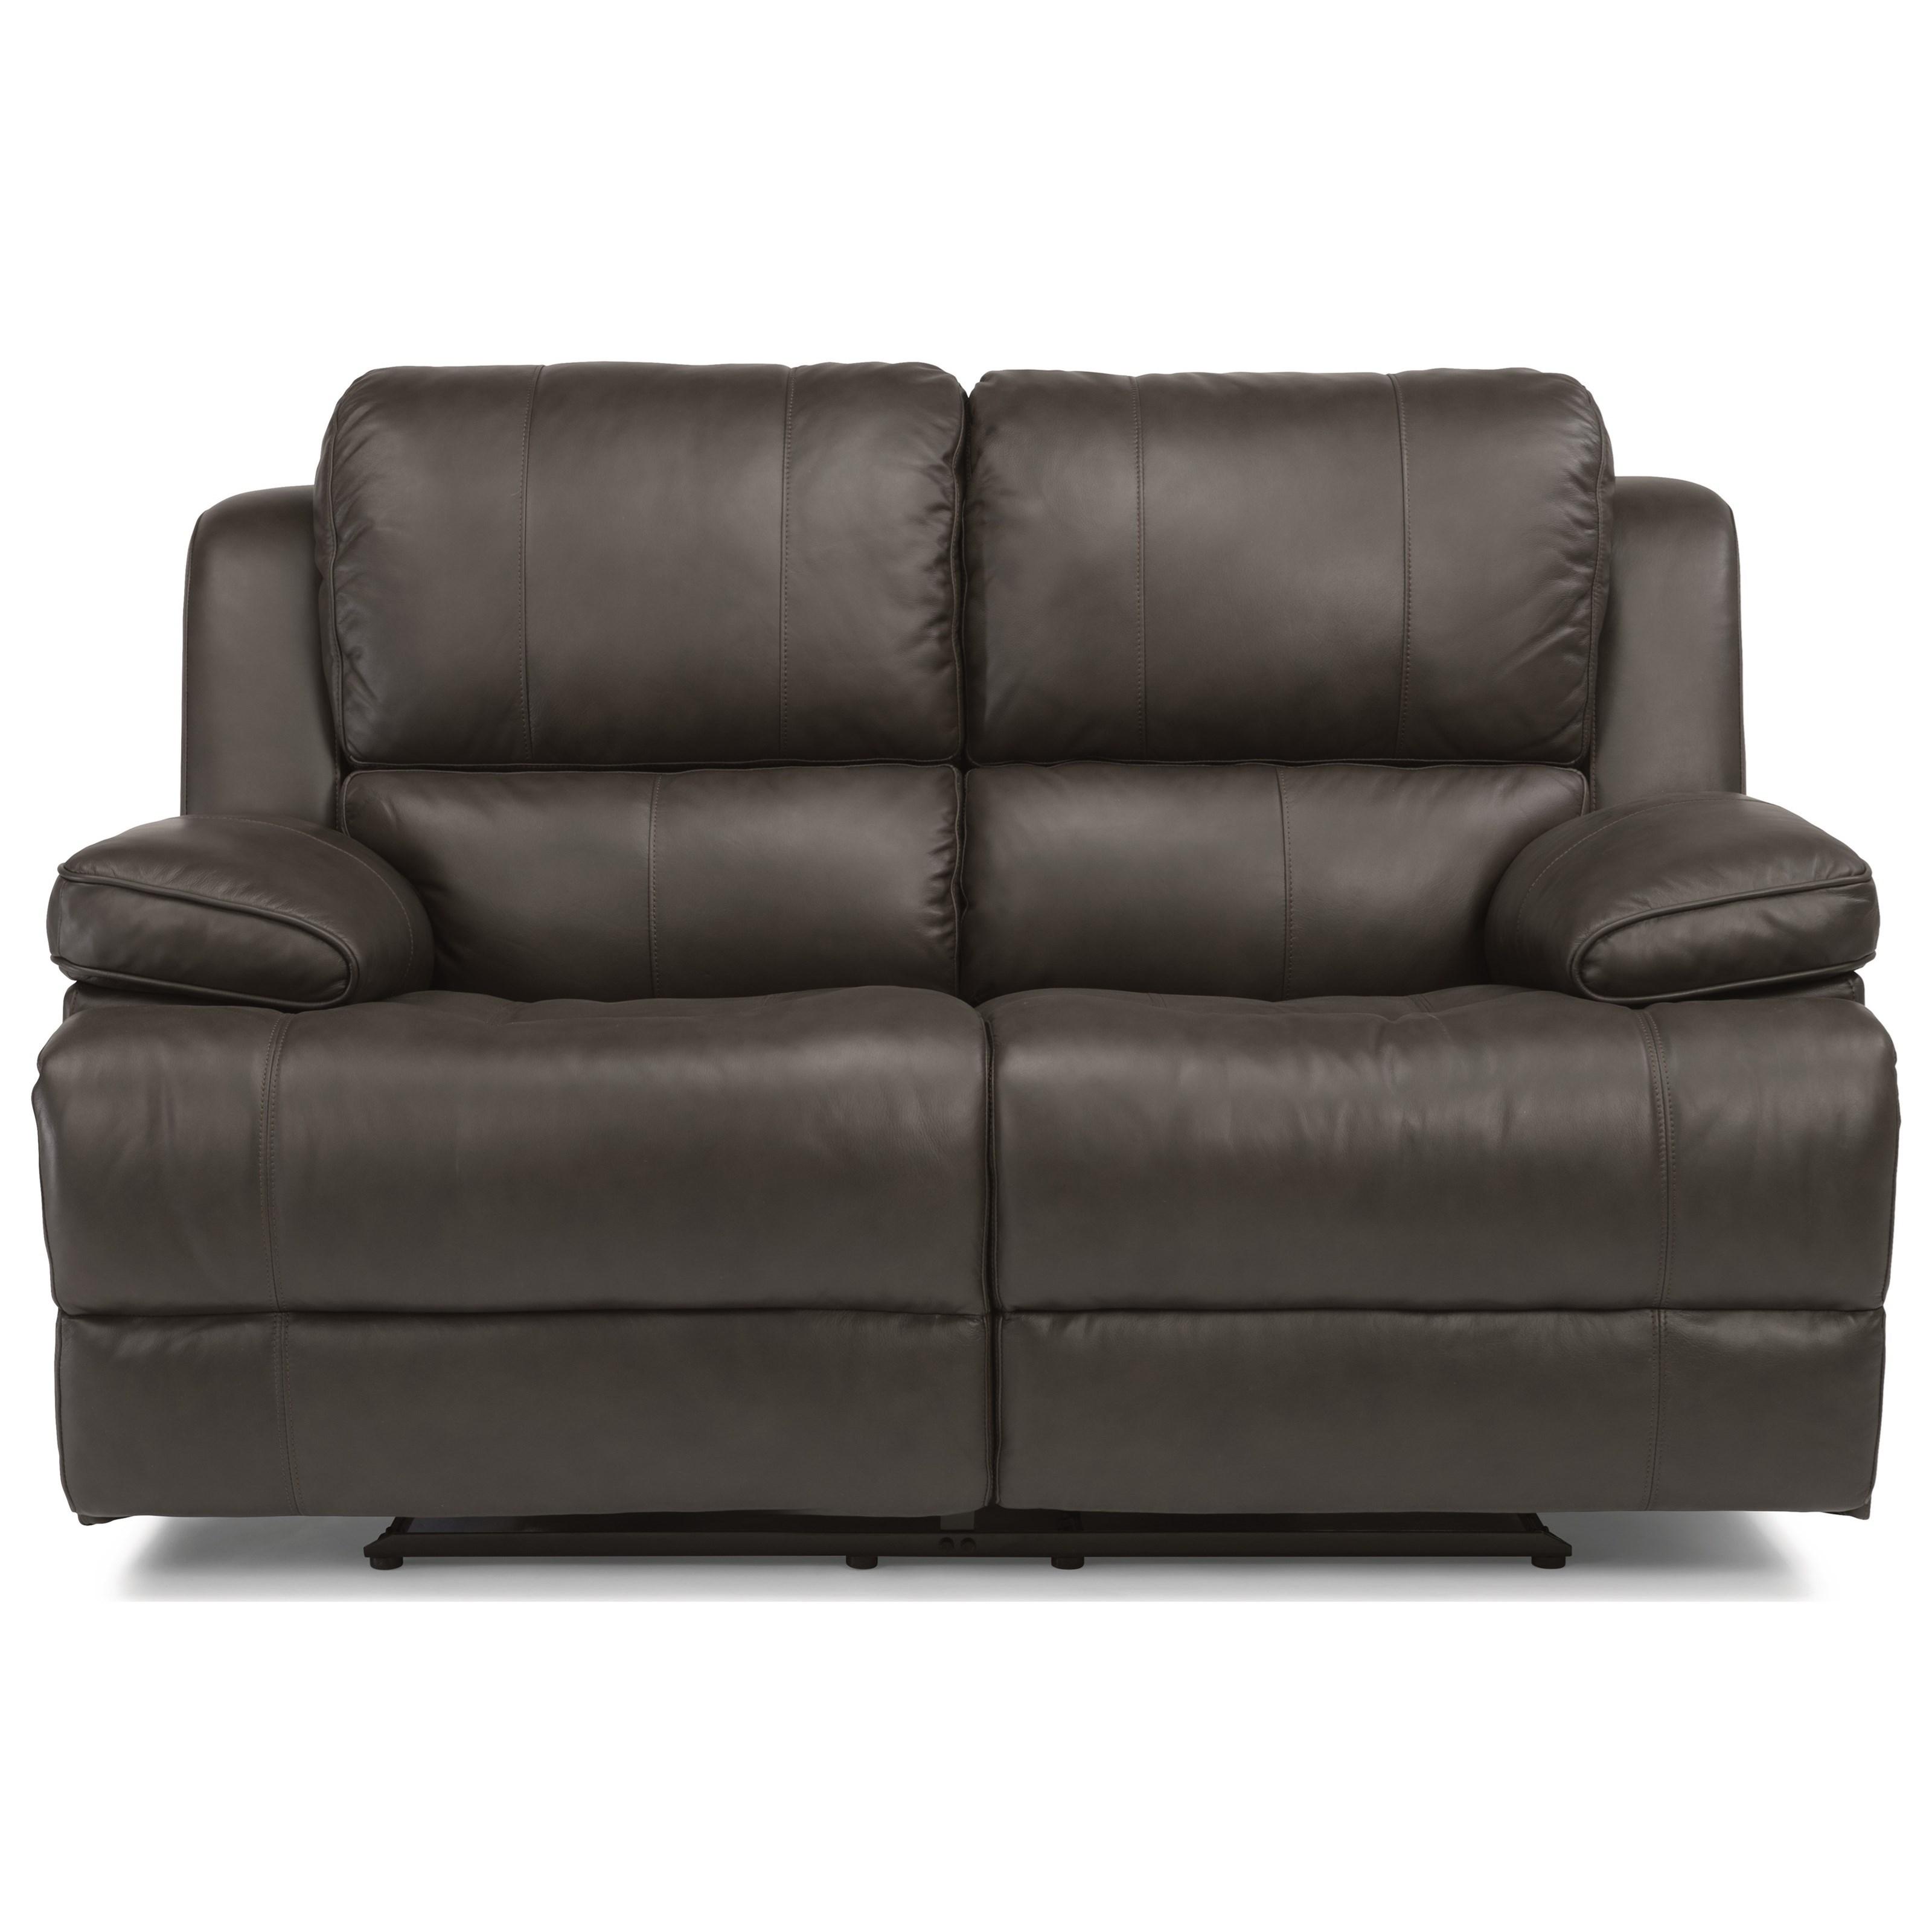 Flexsteel Furniture Uk: Flexsteel Latitudes-Simon 1831-60P Casual Power Reclining